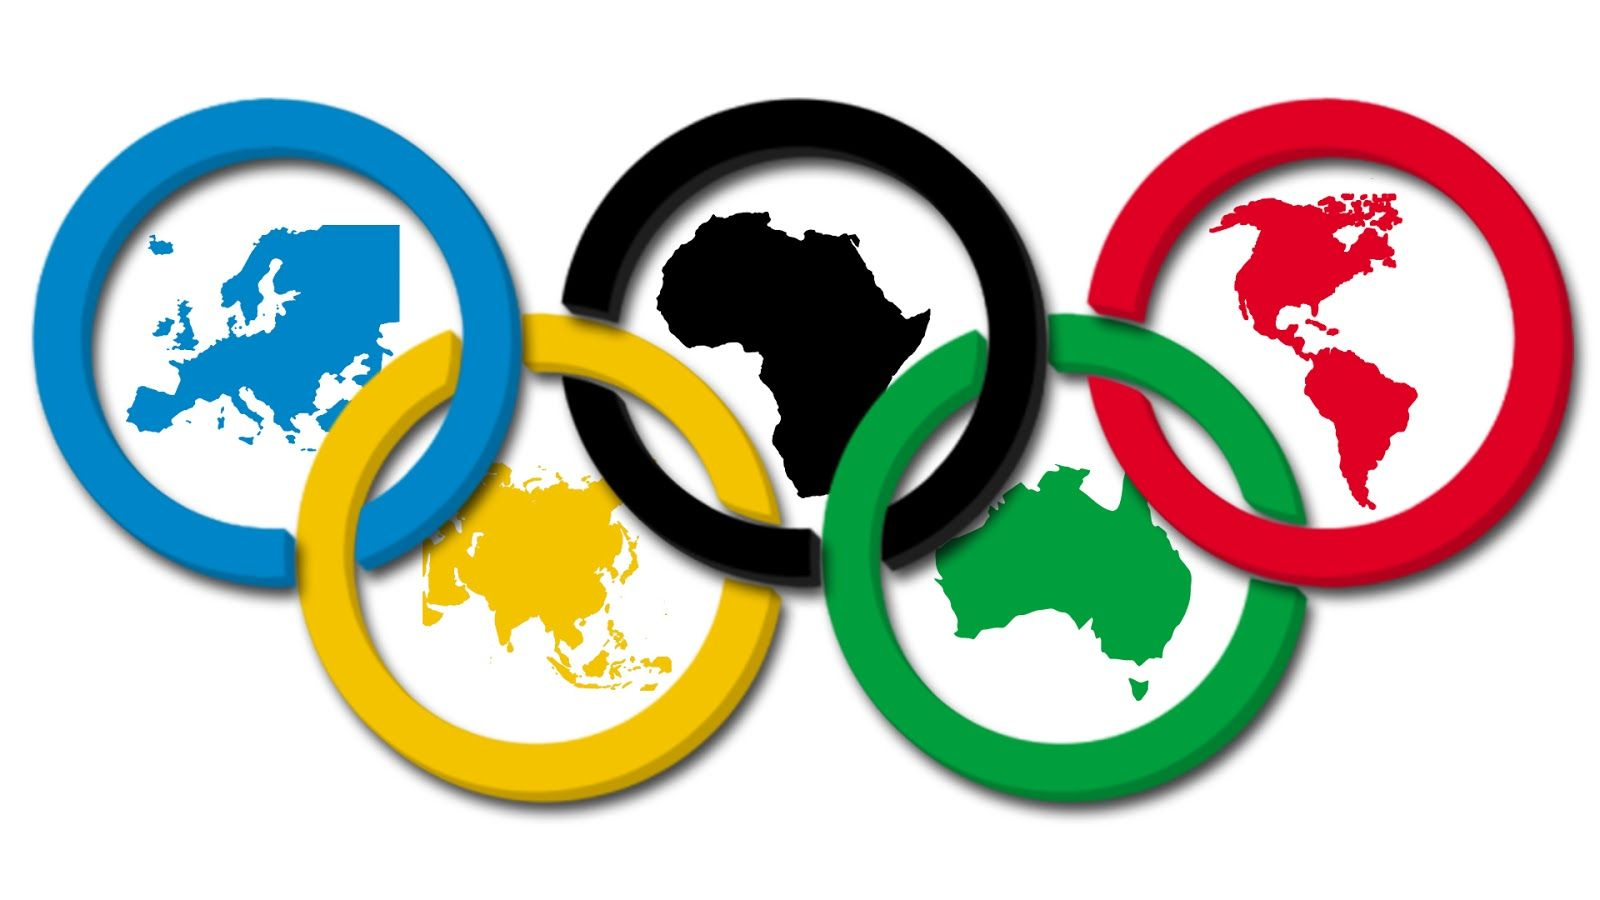 anéis olímpicos cores continentes - Pesquisa Google | Atletas ...